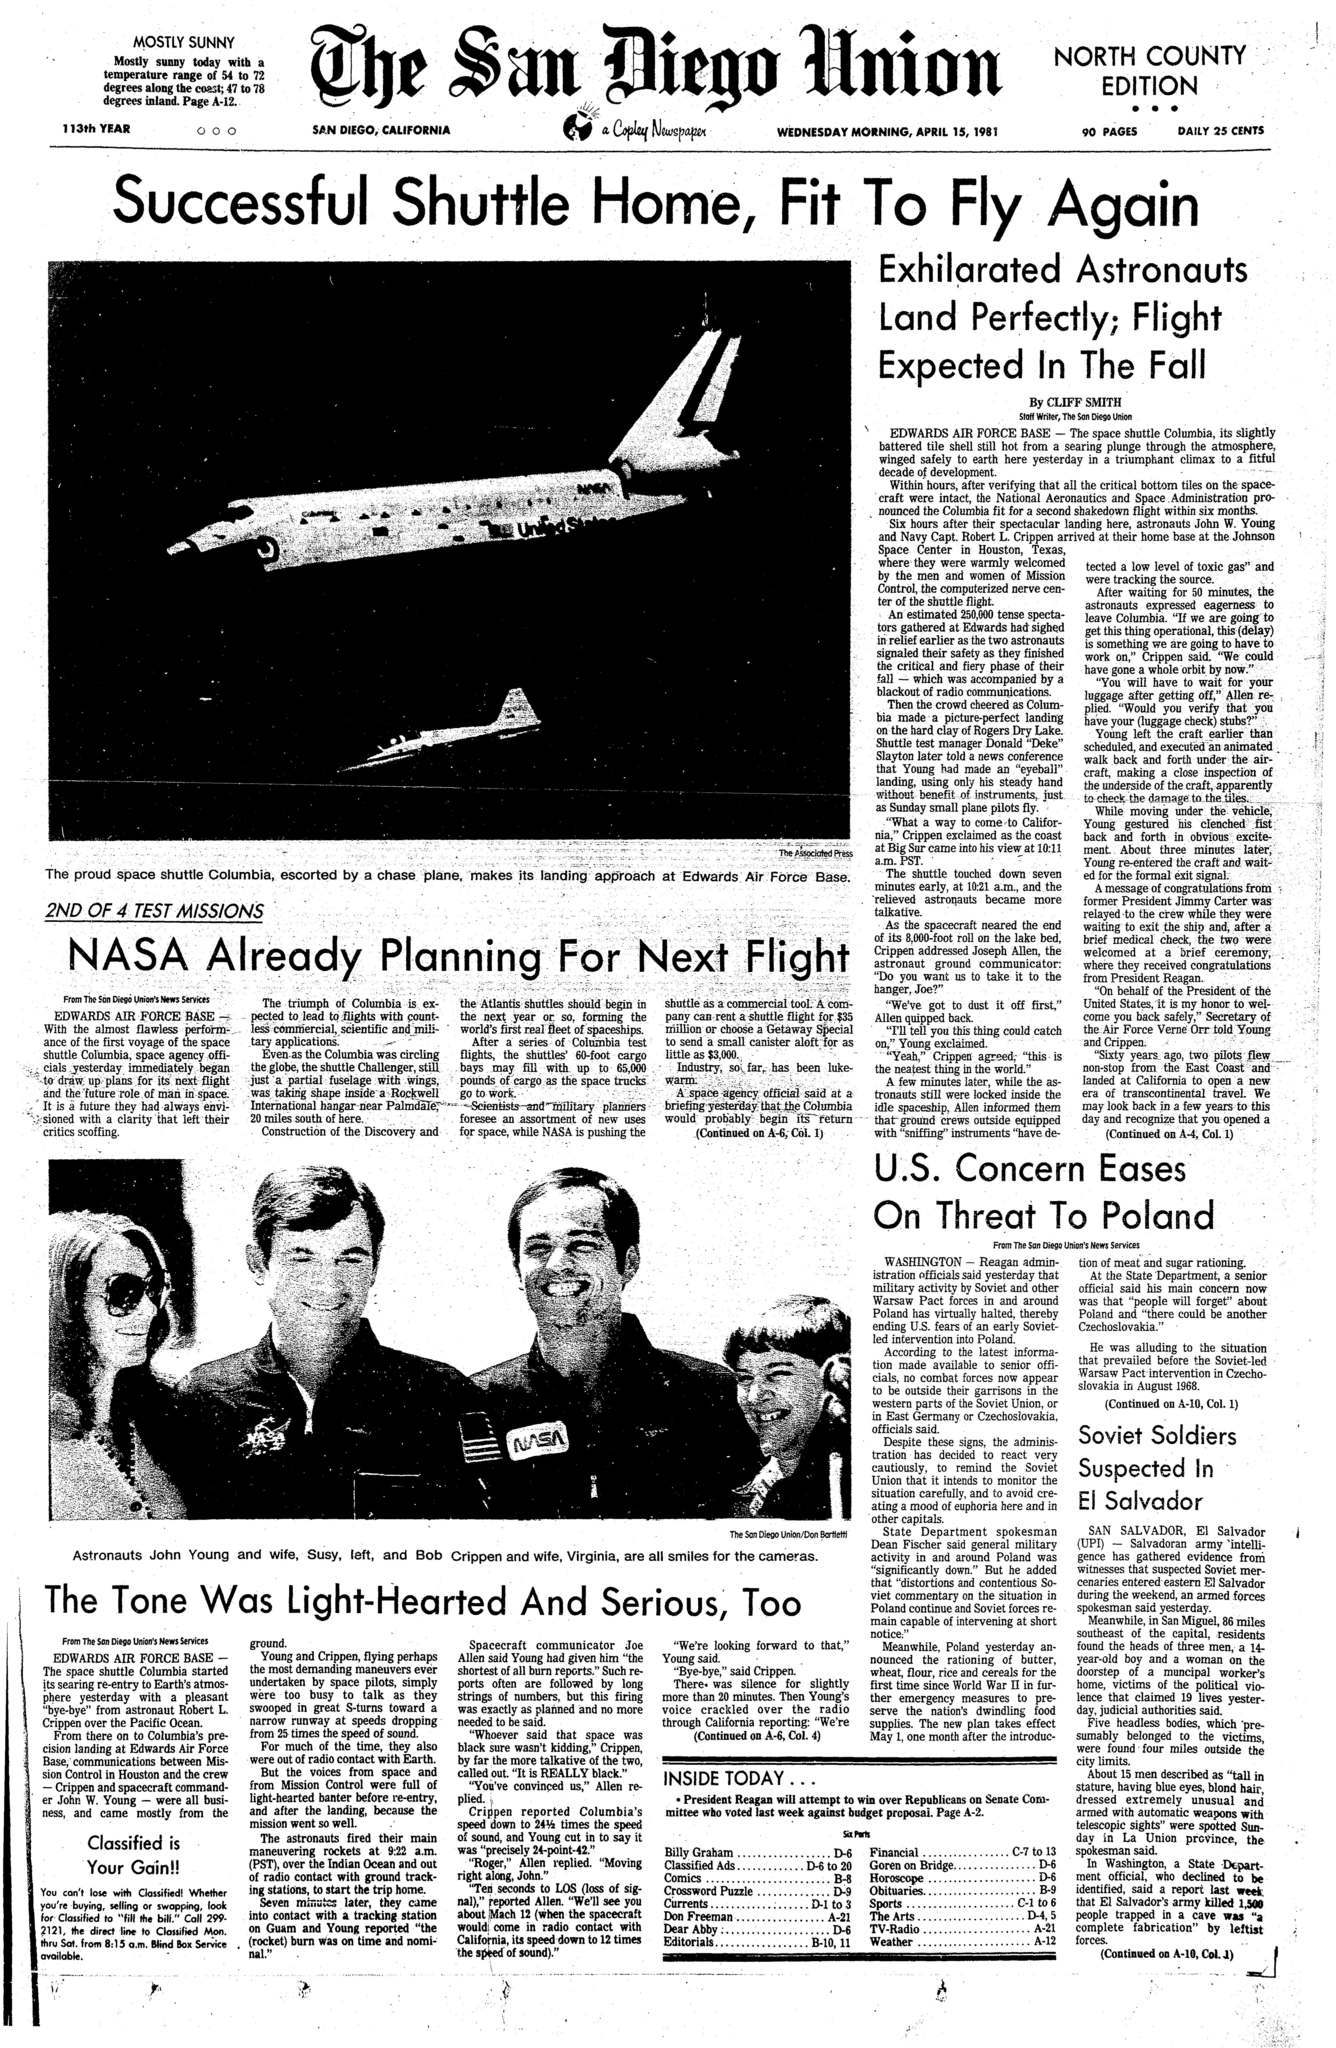 April 15, 1981